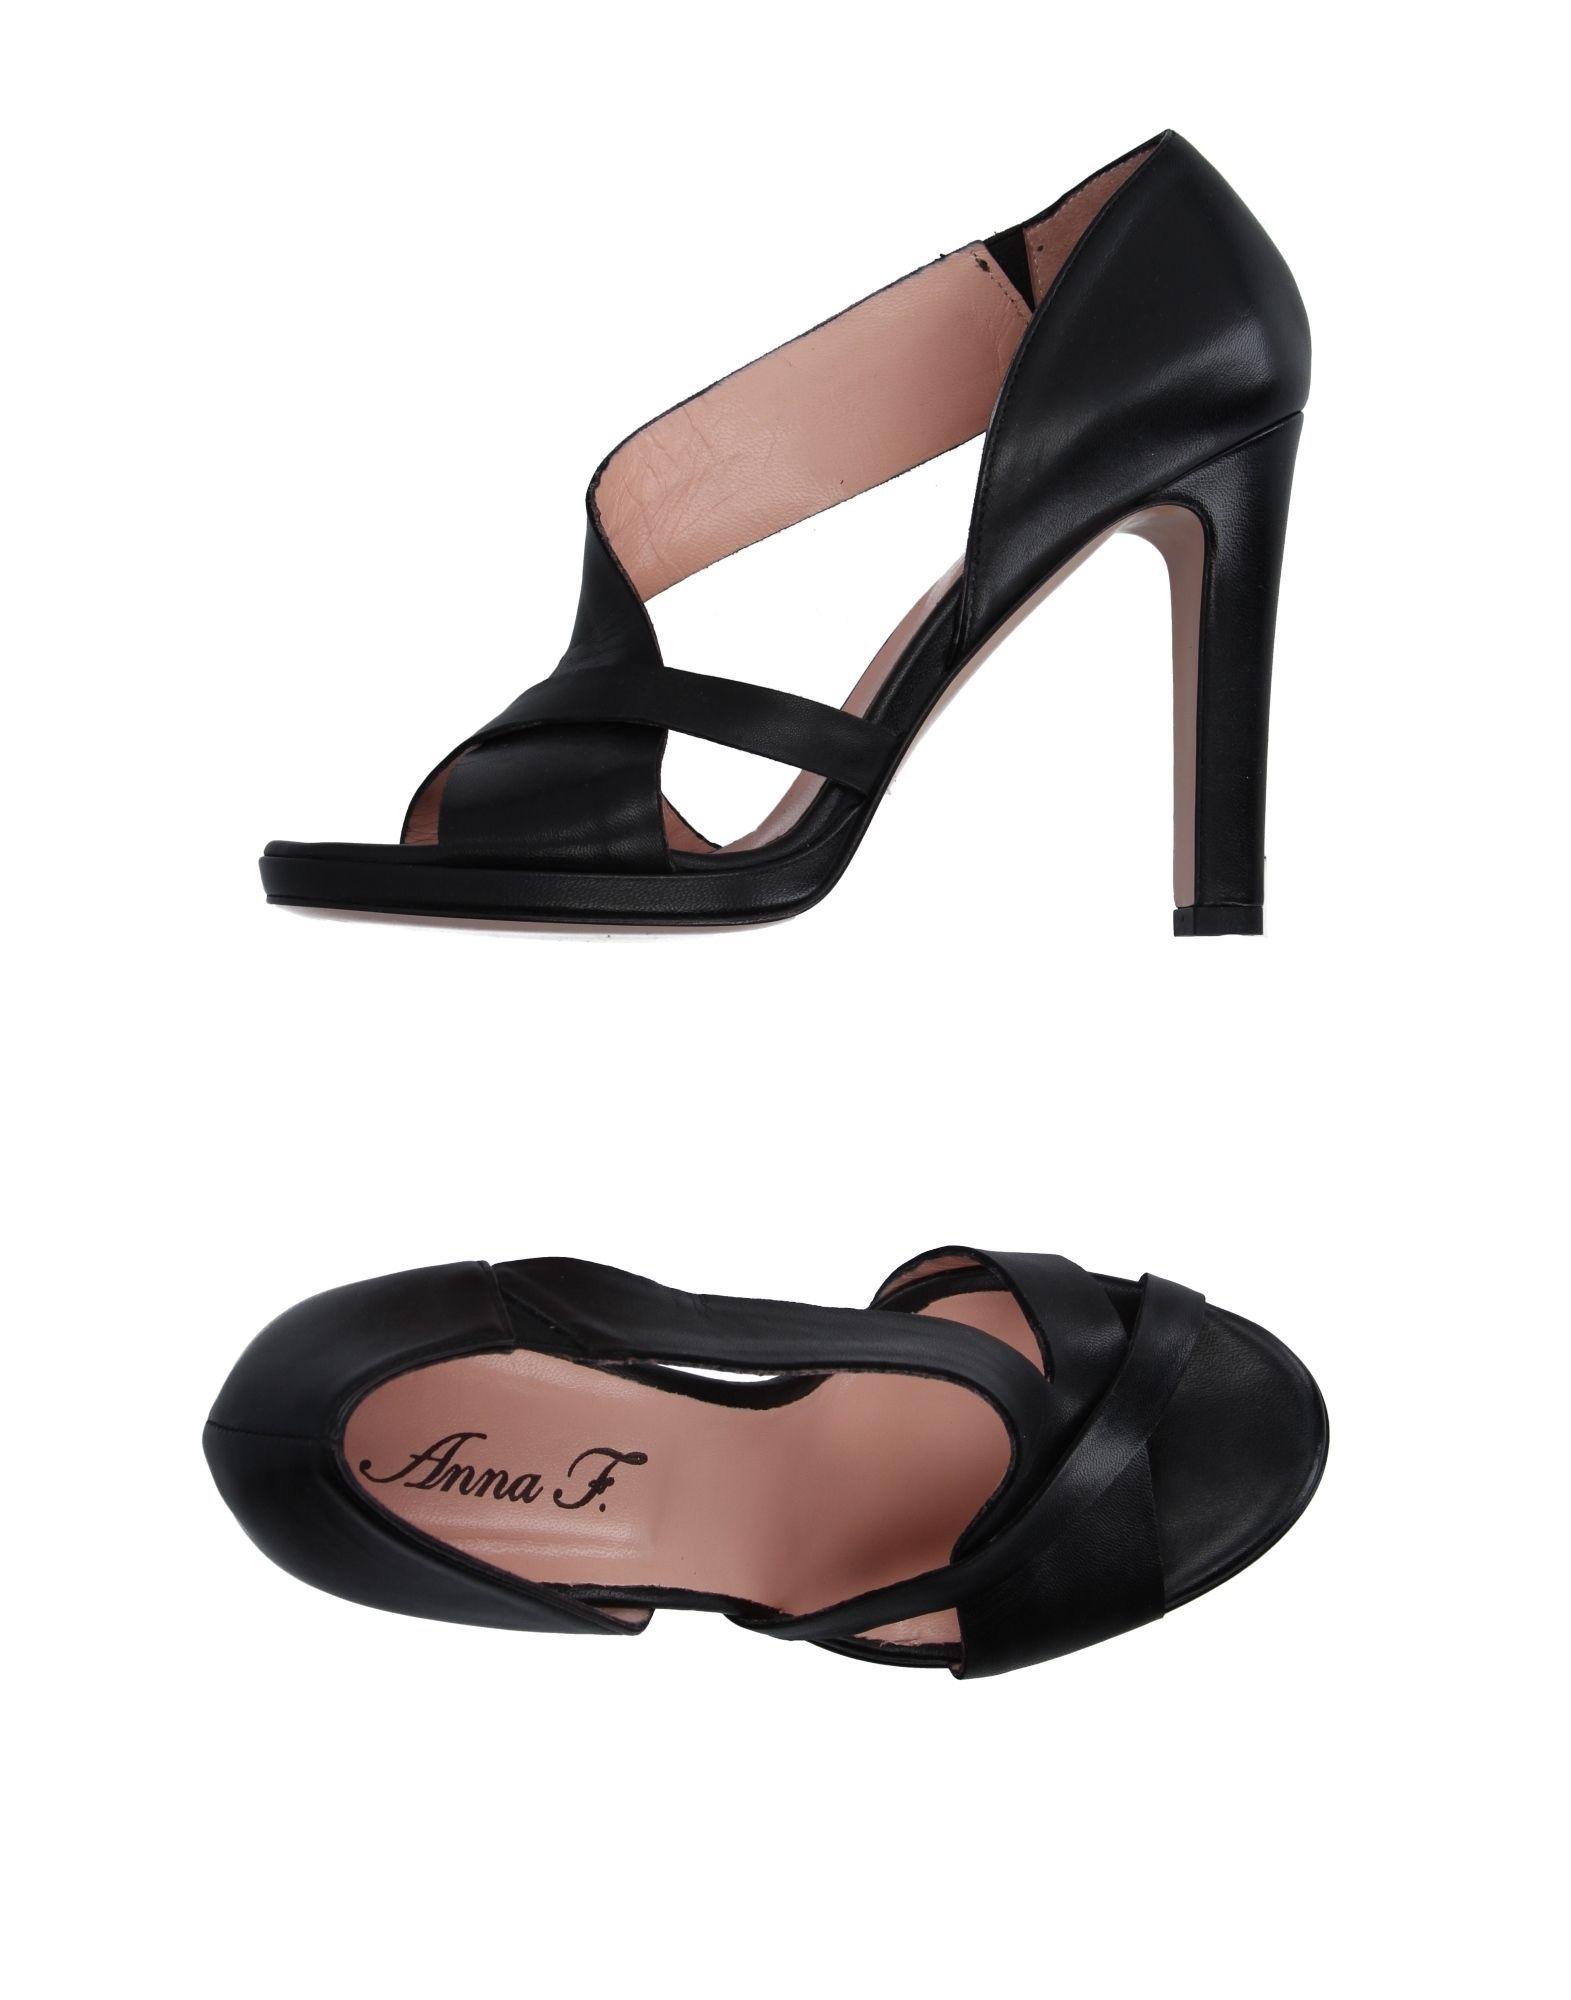 Anna F. Black Nappa Leather Heeled Sandals